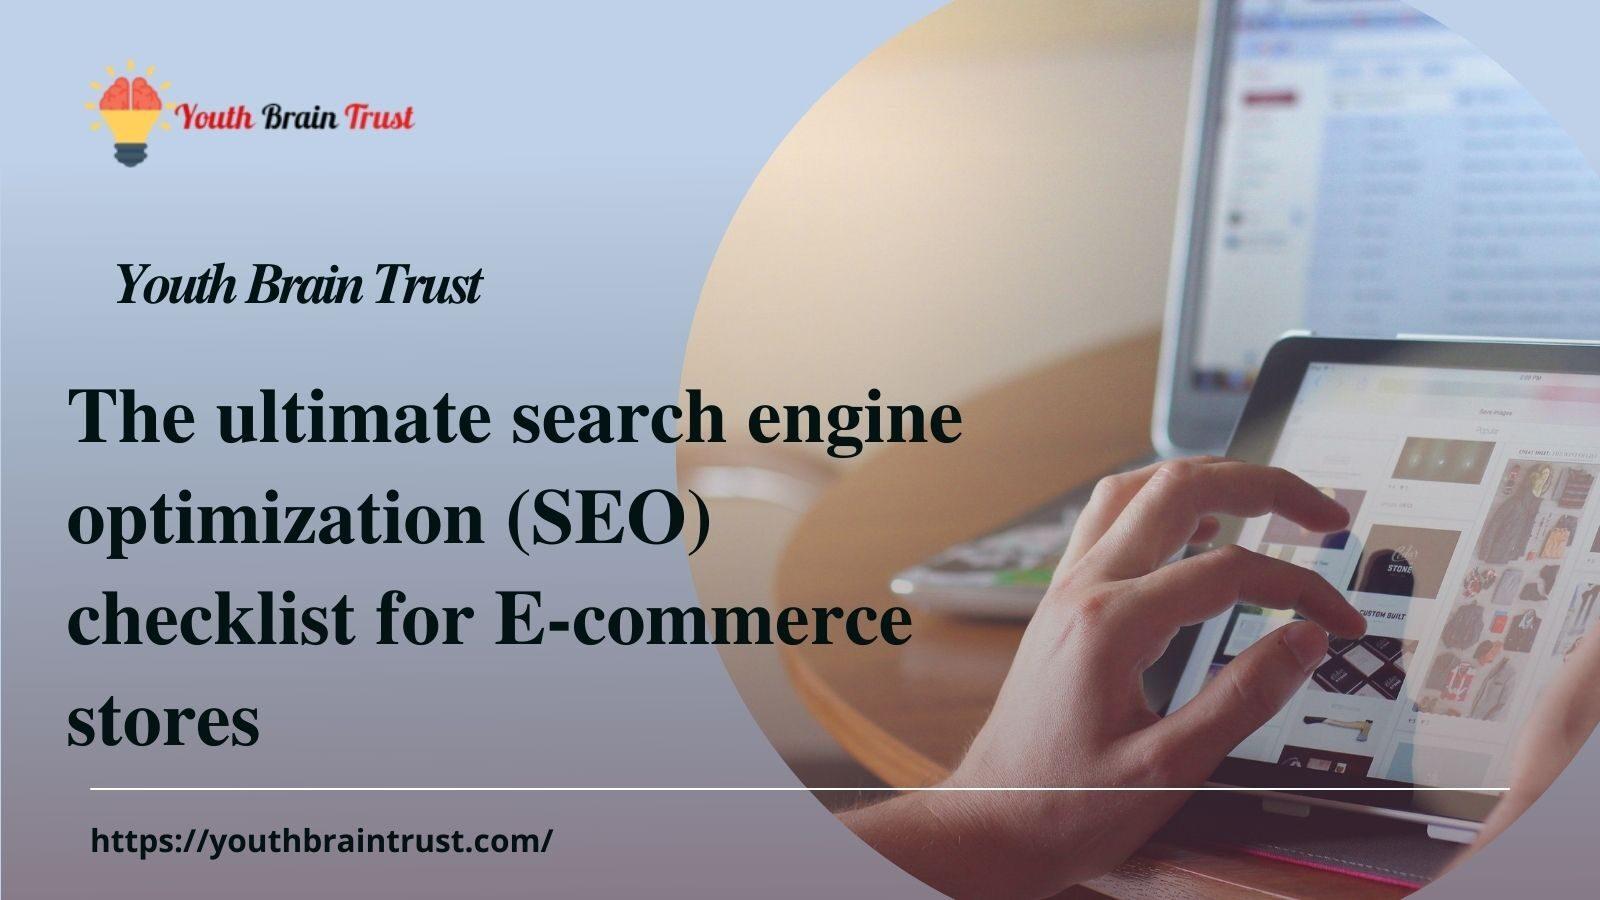 Search engine optimization checklist for E-commerce stores